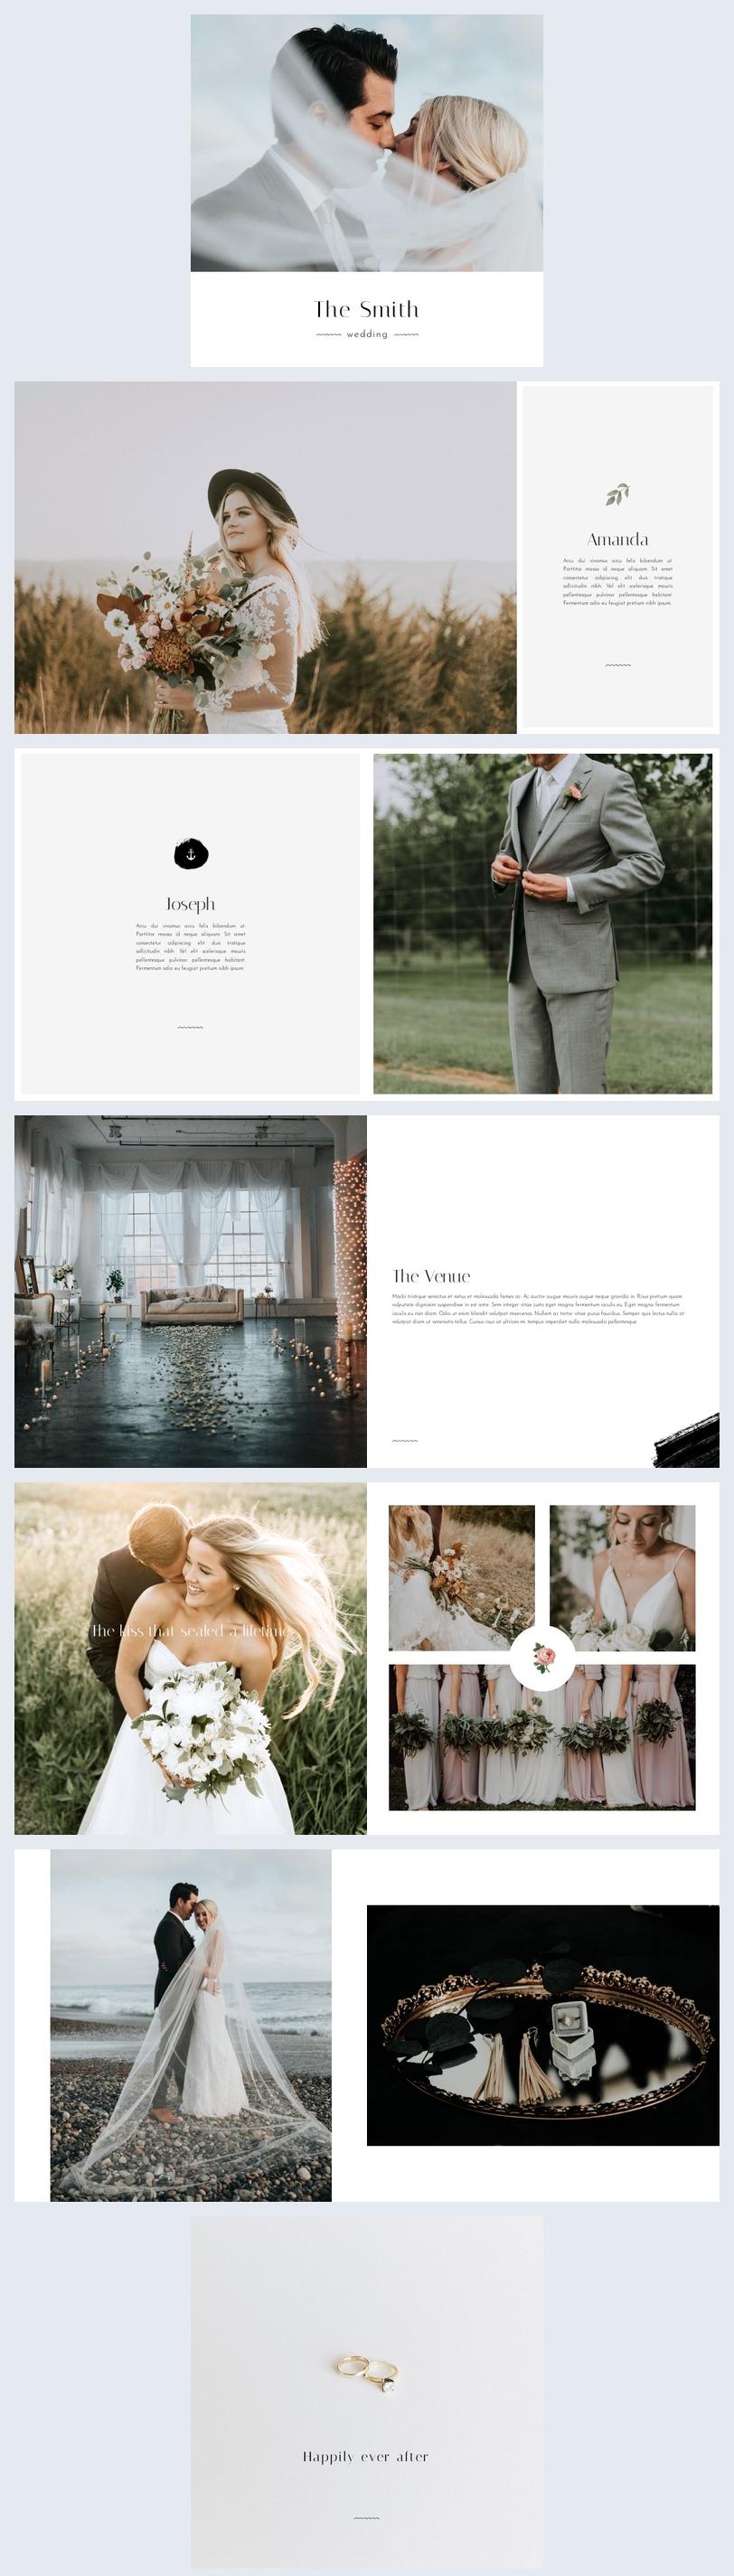 Online Wedding Album